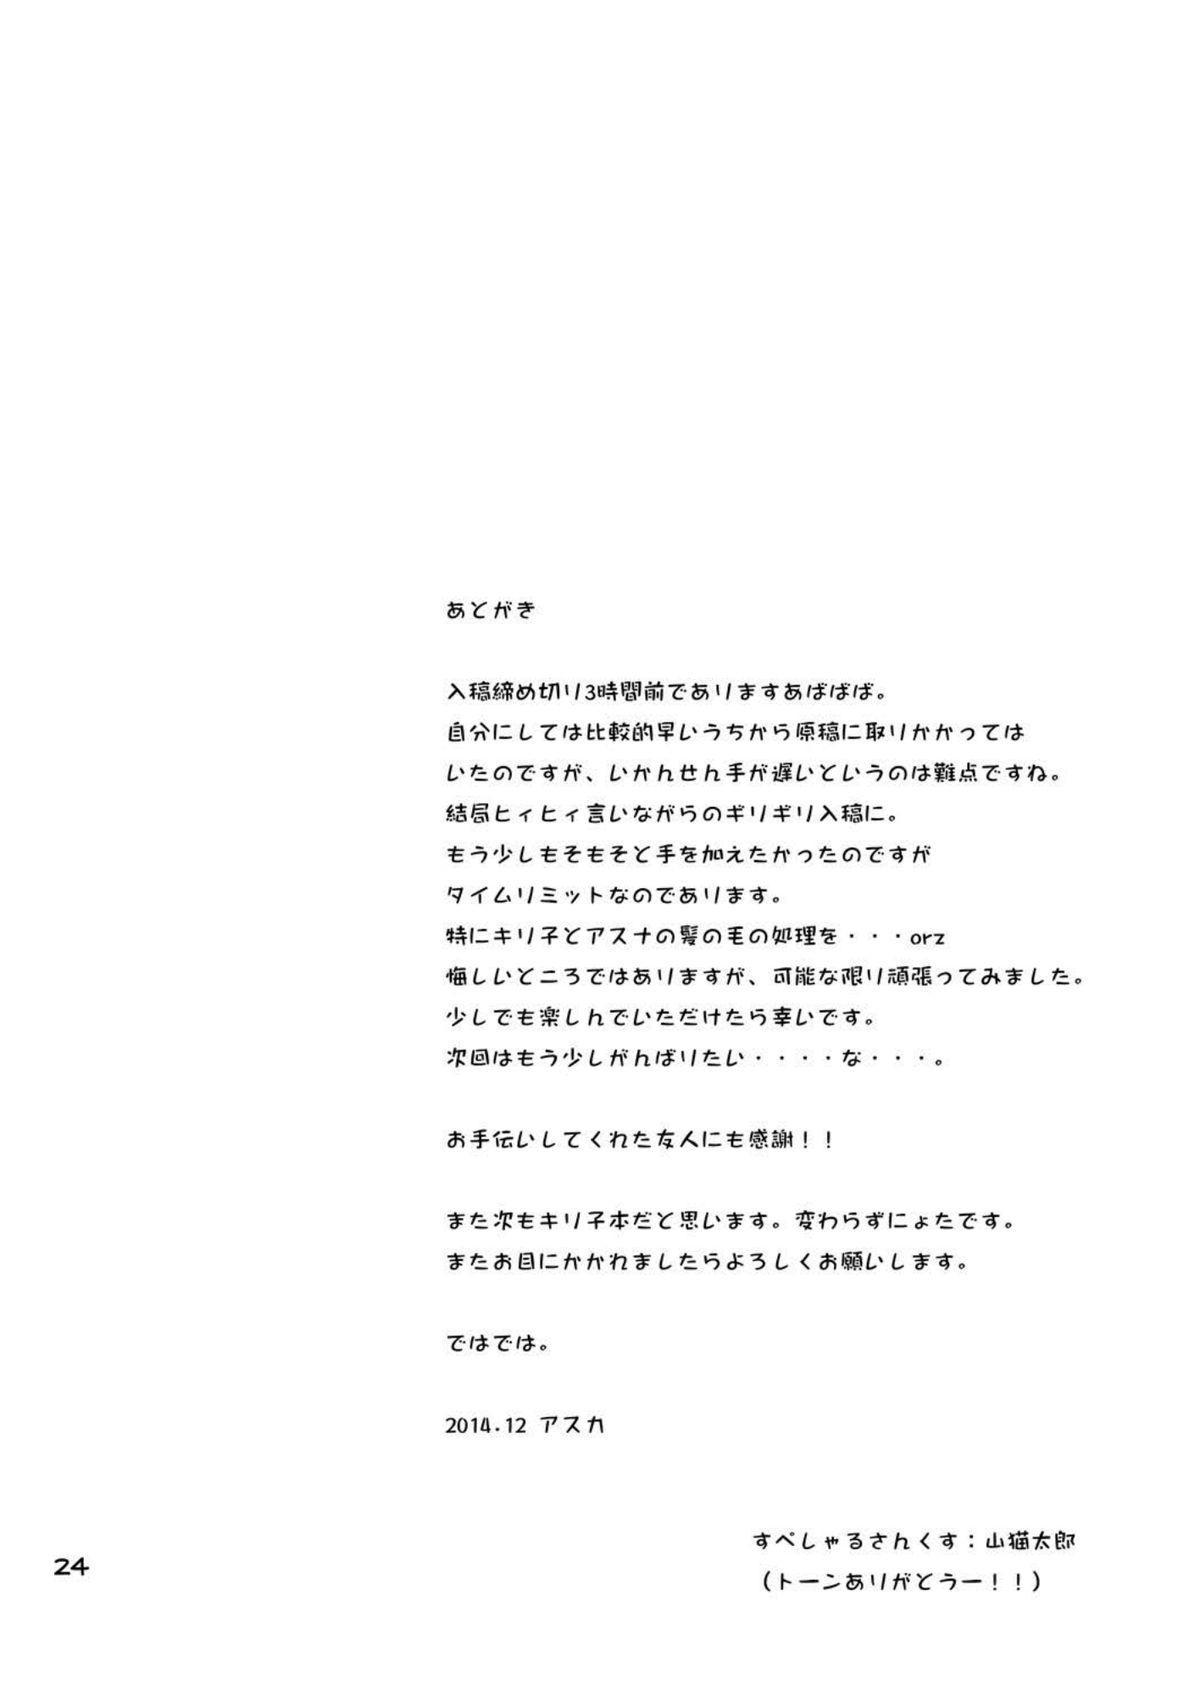 Kiriko-chan to Asobou! 23